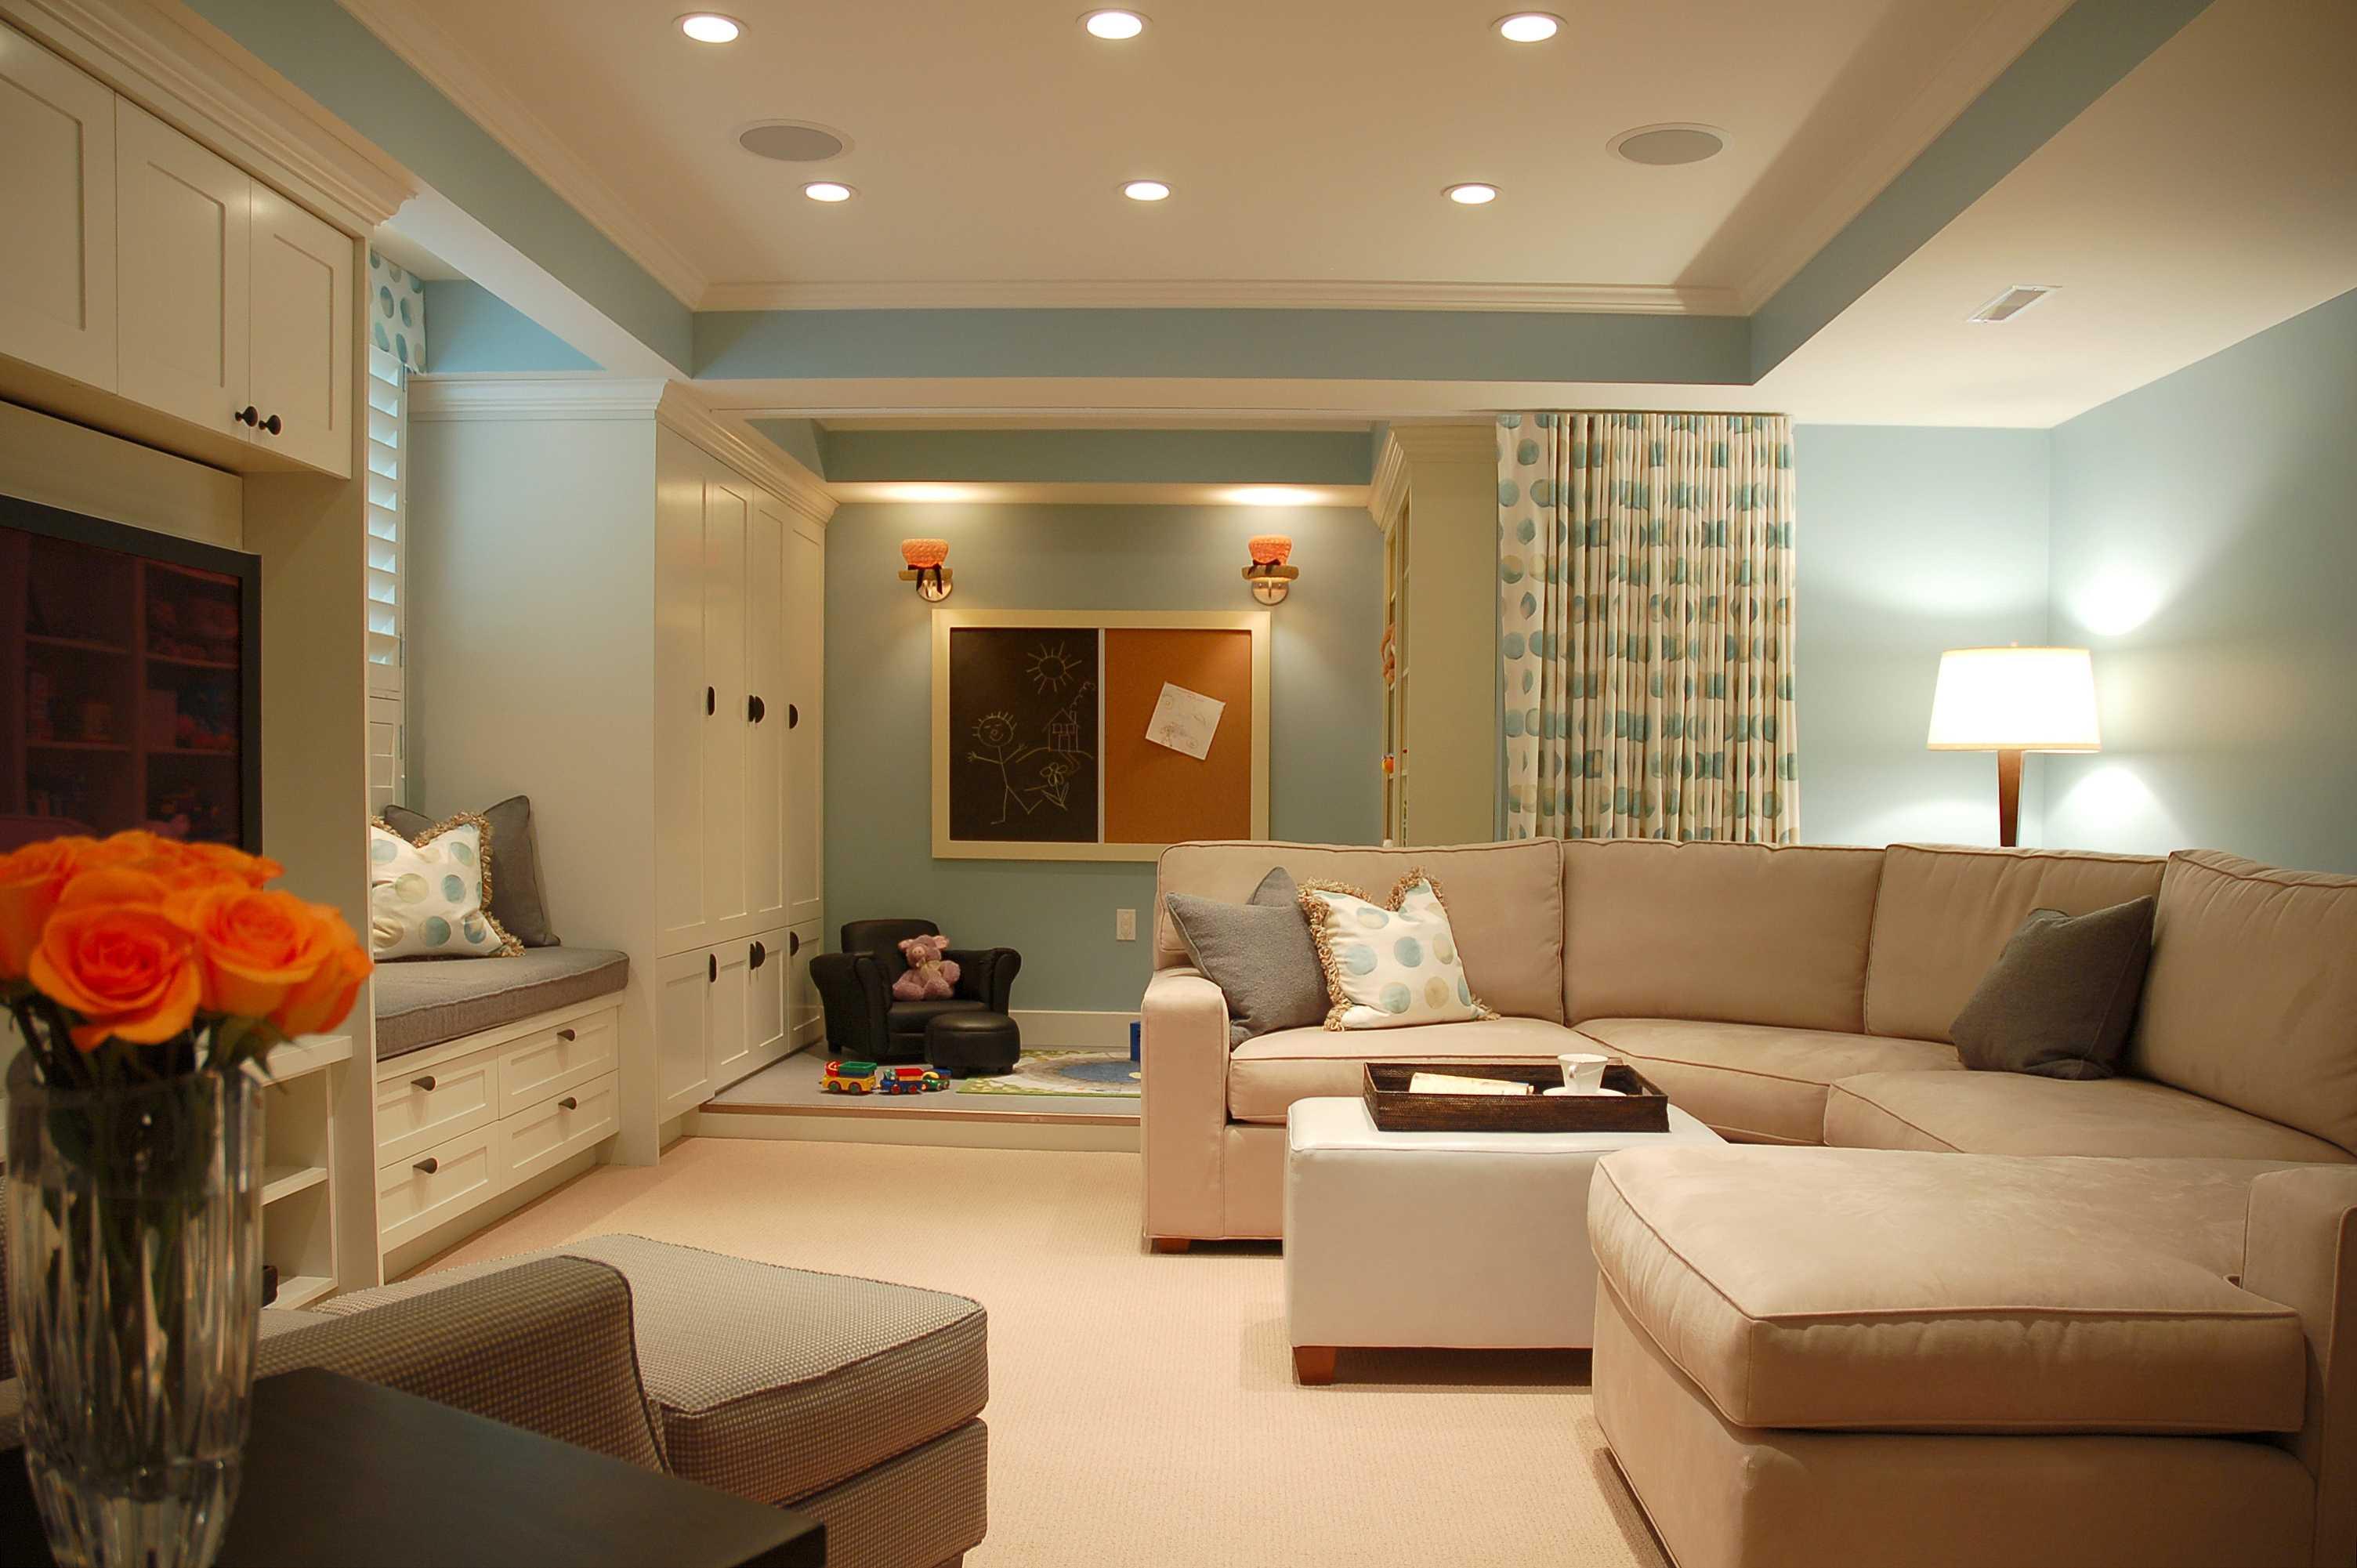 Rumah minimalis pun dapat ditambahkan sedikit sentuhan mewah - 5 Konsep Desain Interior yang Dapat Dipadukan dengan Model Plafon Gypsum Elegan